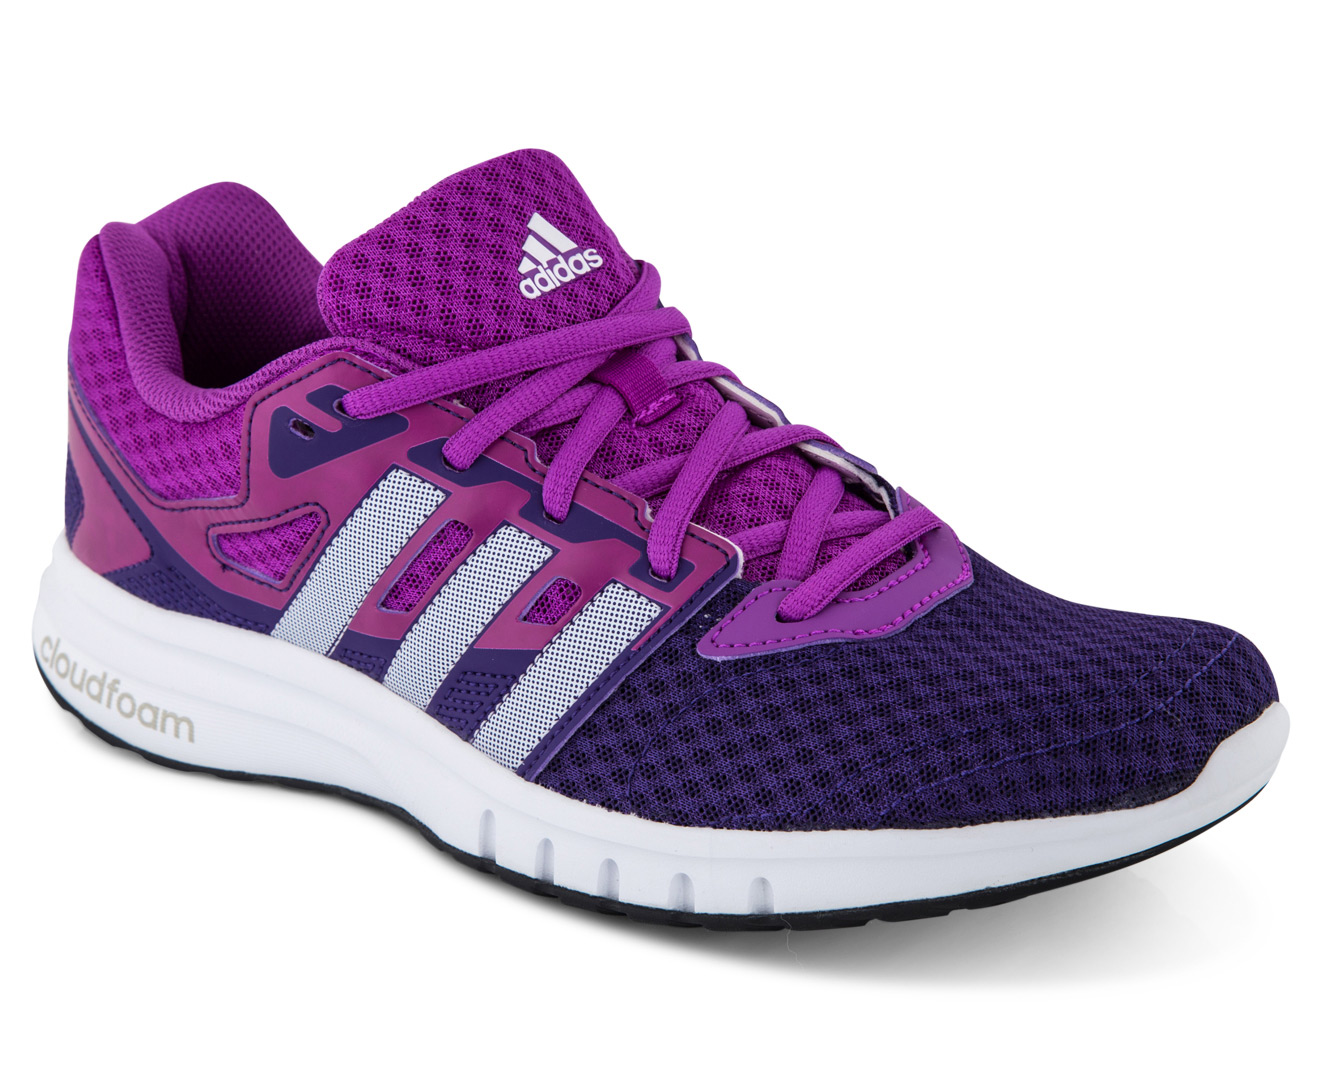 Adidas Women's Galaxy 2 Shoe - Unity Purple/White/Shock